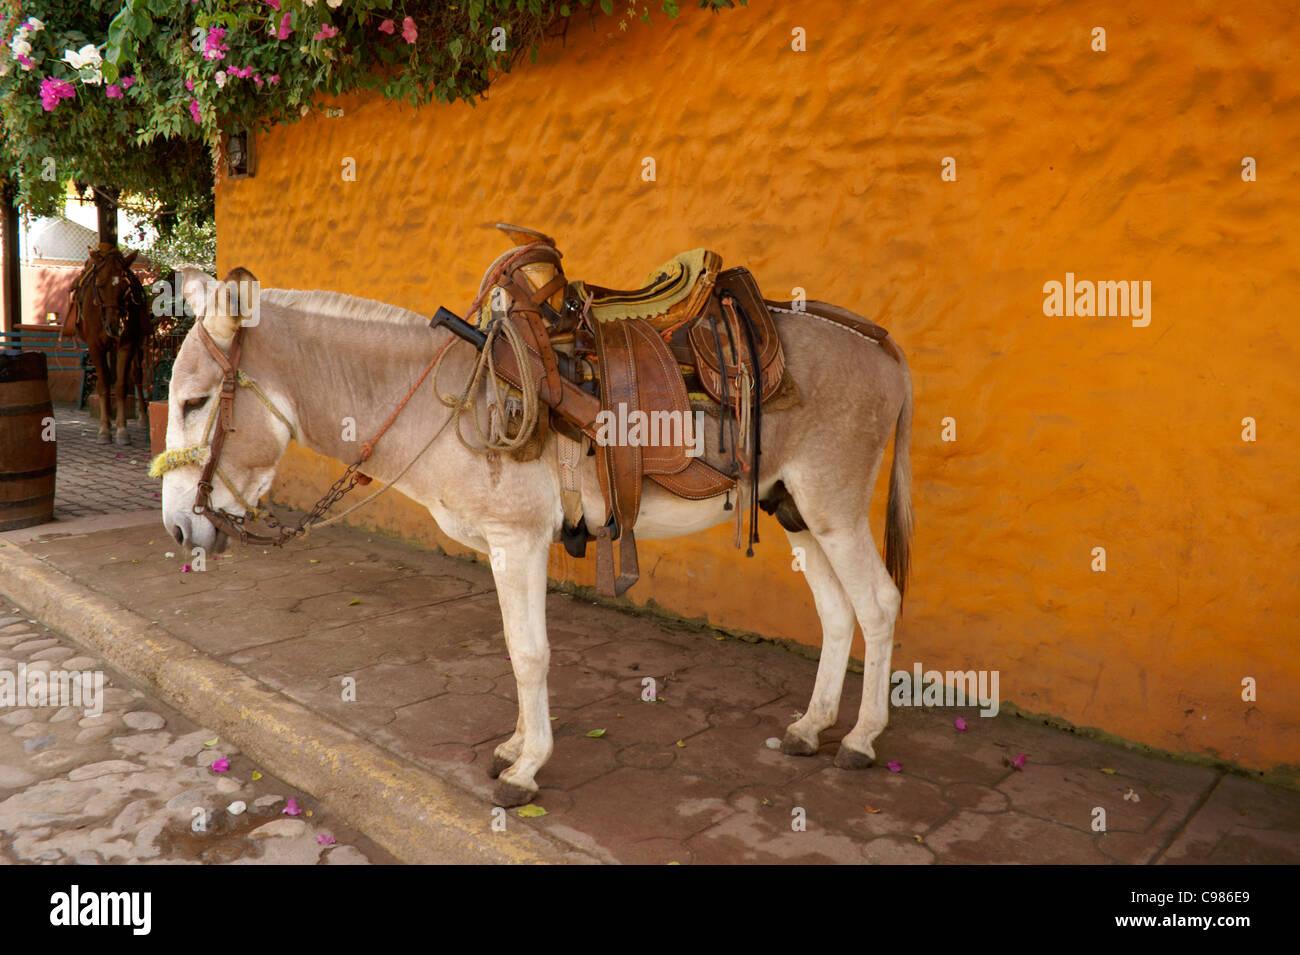 Quelite Stock Photos & Quelite Stock Images - Alamy